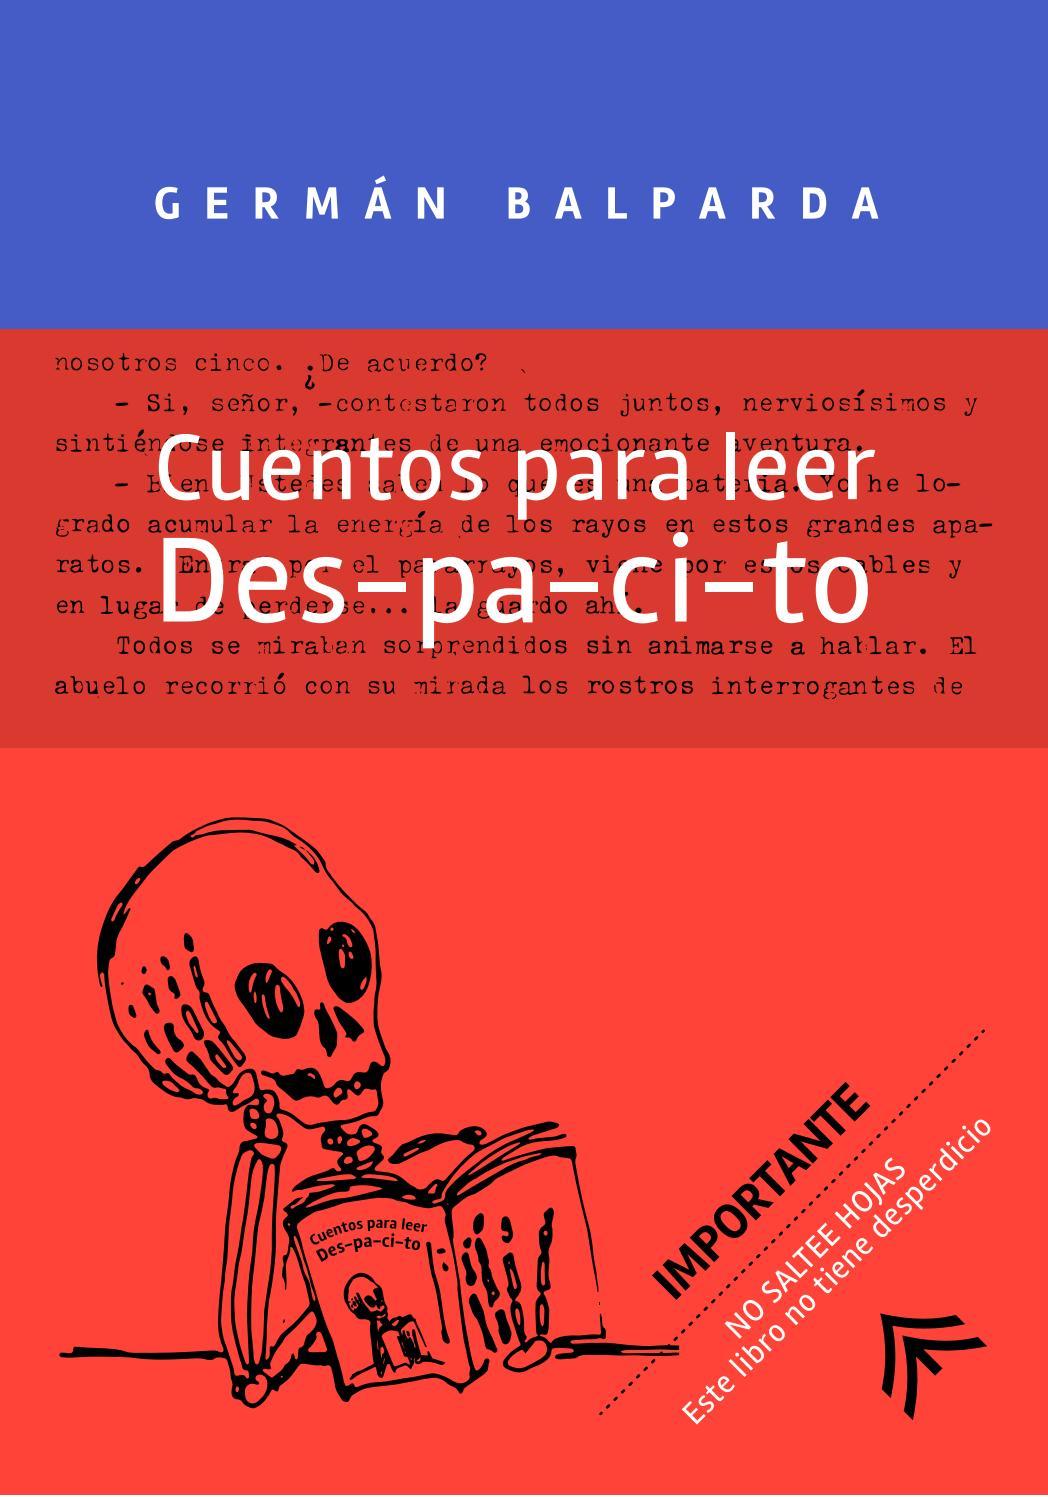 Cuentos para leer des-pa-ci-to. Germán Balparda by Anabella Corsi - issuu c97af77df40b